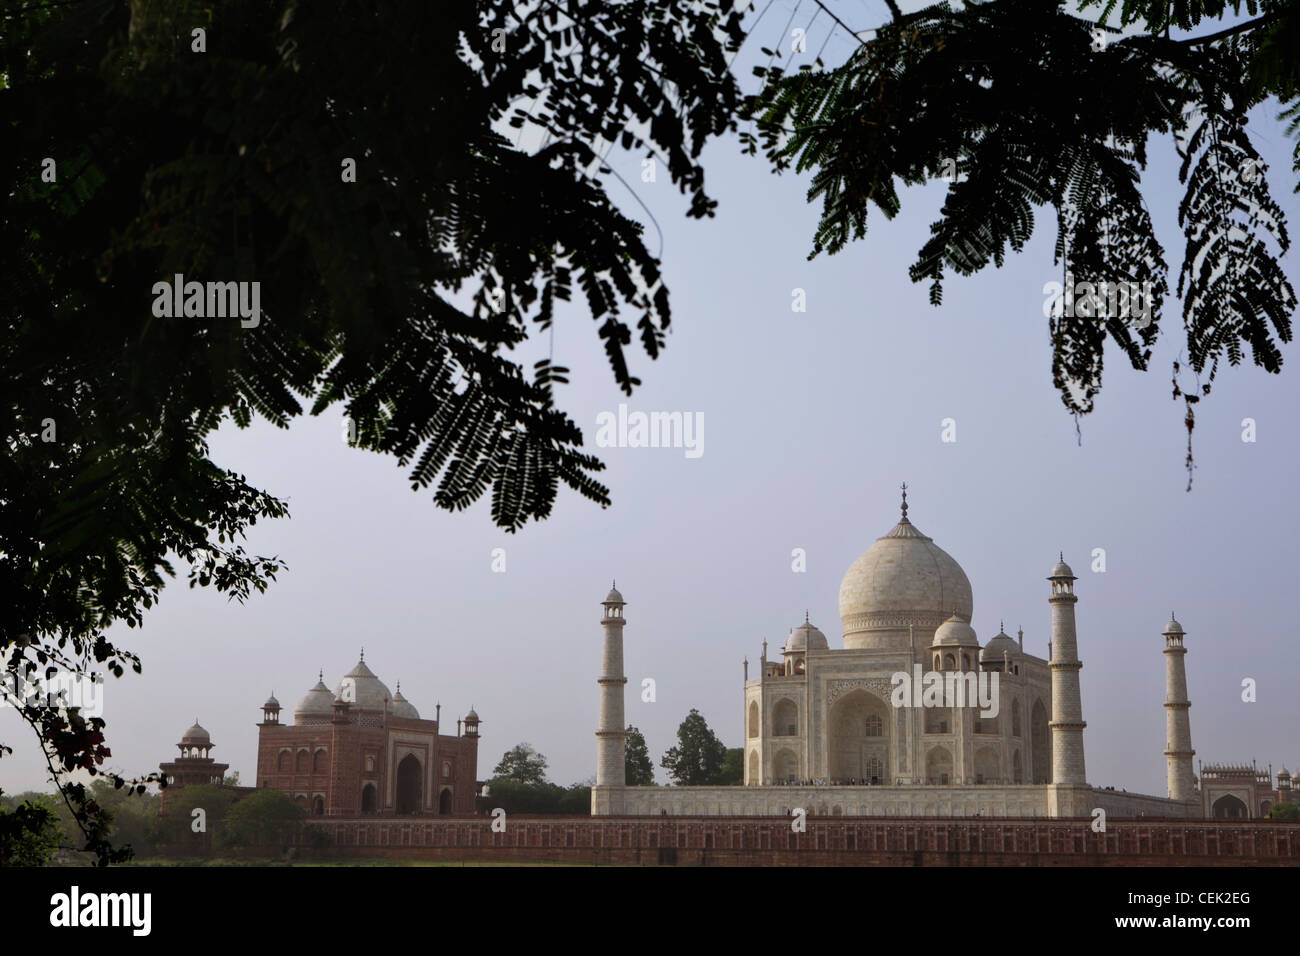 Wide shot of the Taj Mahal, Agra, India - Stock Image